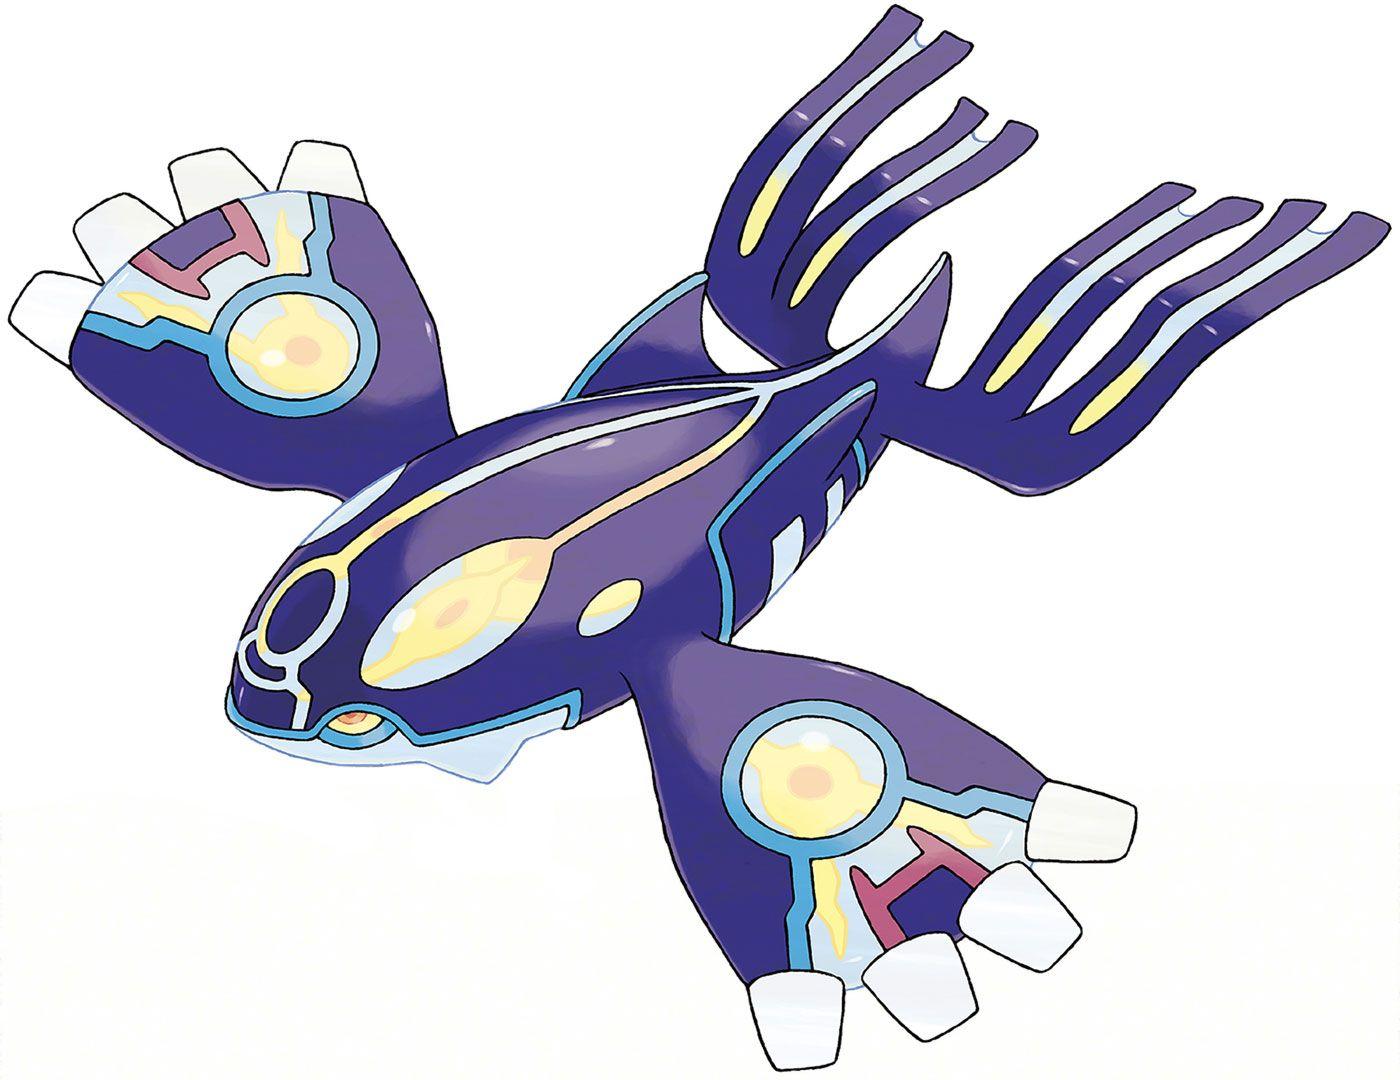 Primal Kyogre Gif Primal Kyogre  Characters & Art  Pokémon Omega Ruby And Alpha